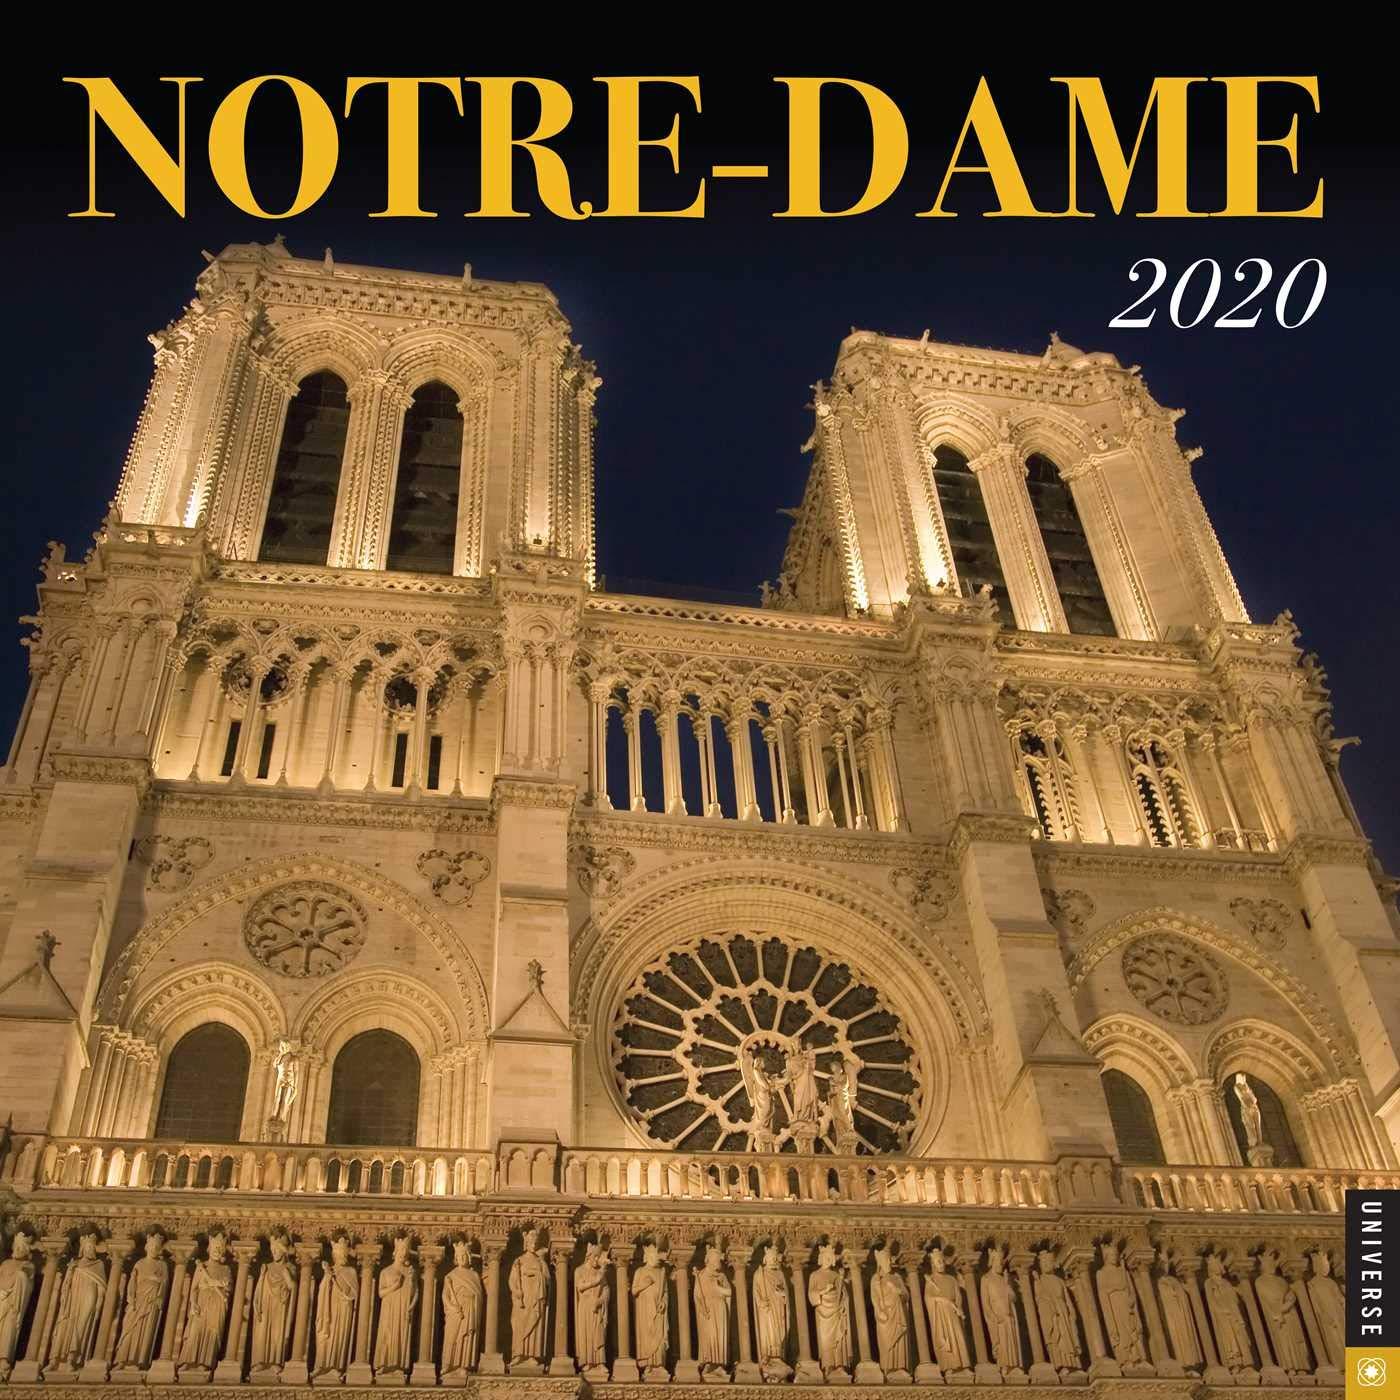 Notre Dame Calendar 2020 Notre Dame 2020 Wall Calendar: Universe Publishing: 9780789337689